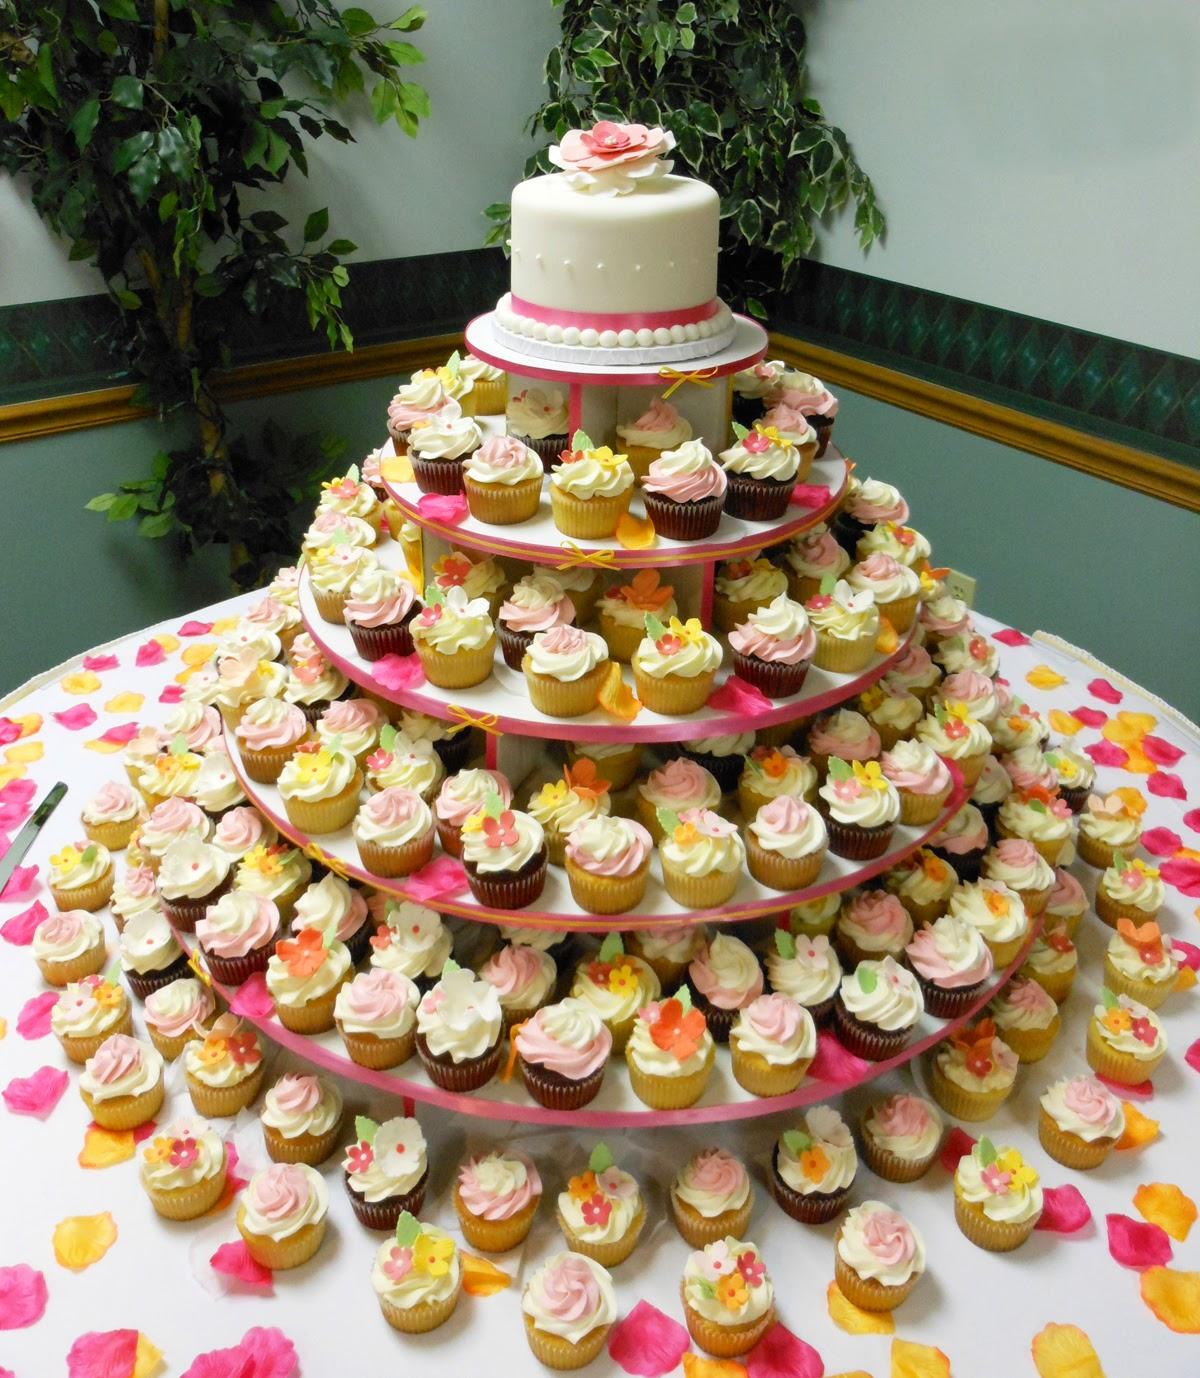 Cupcake Wallpaper: Wedding Cupcake Images, Pictures, Wallpapers